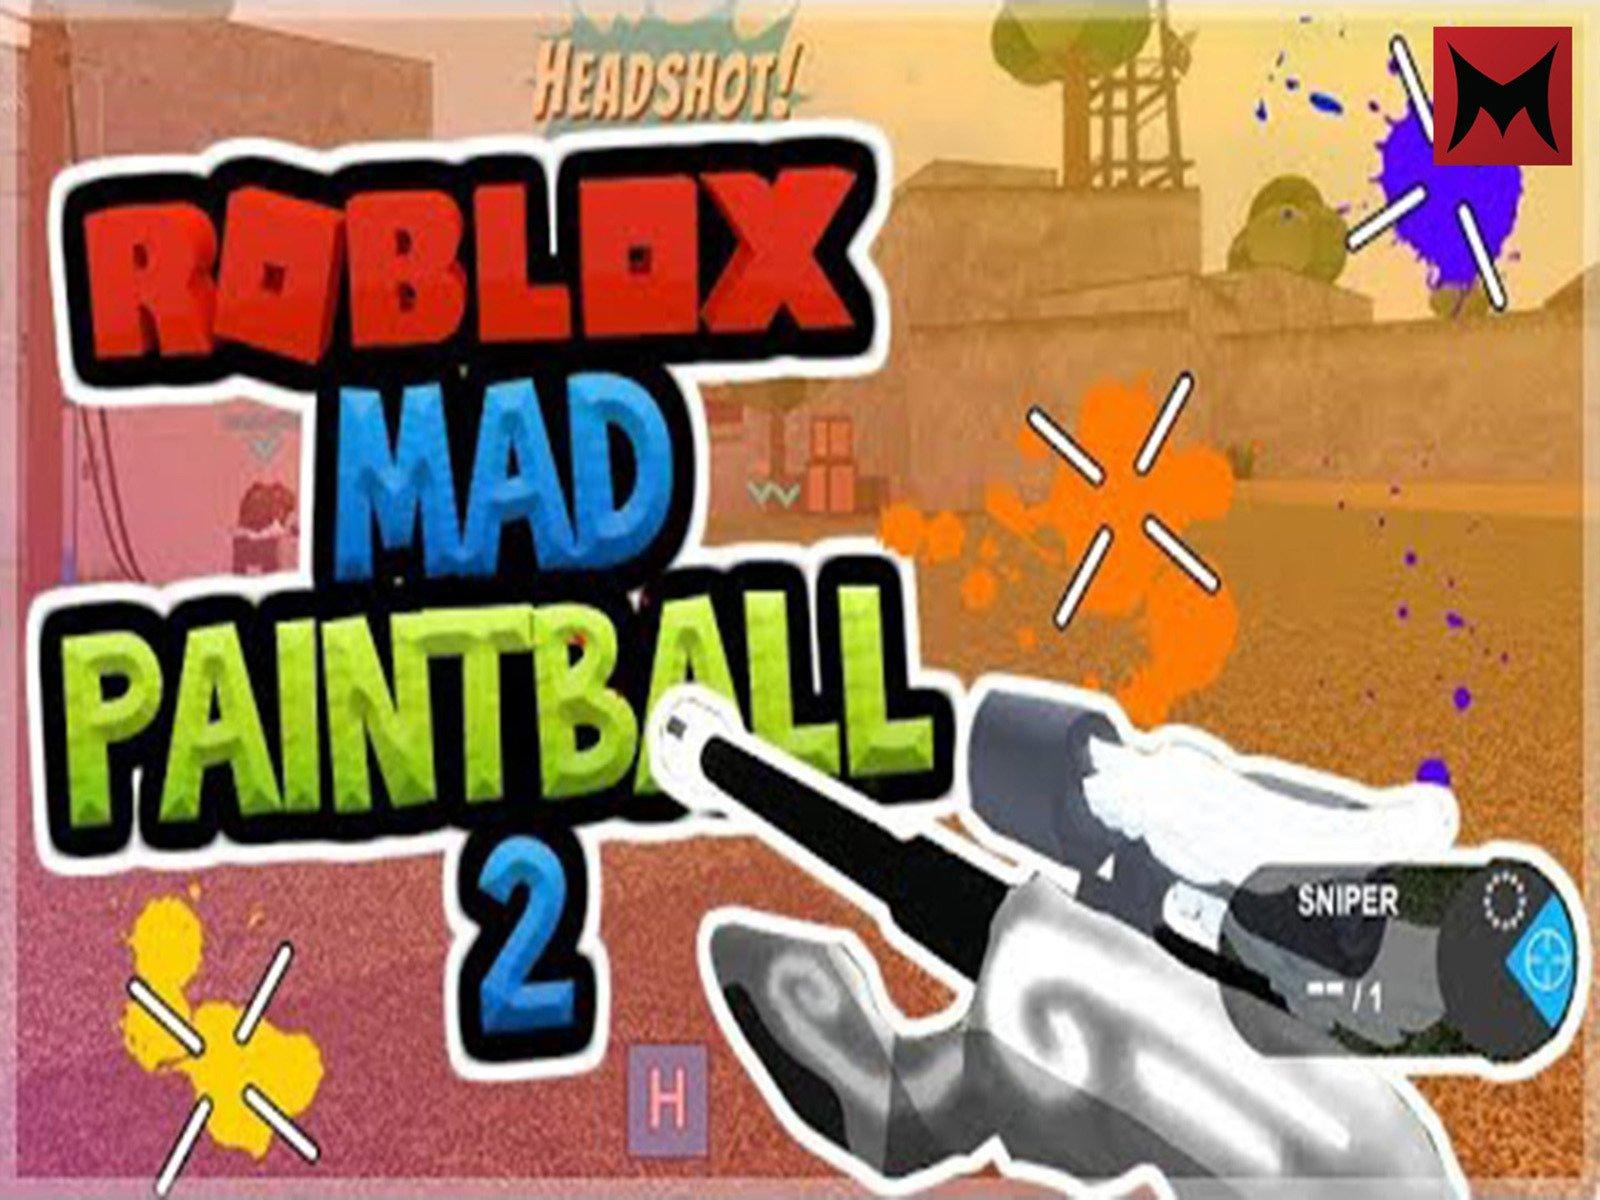 Amazoncom Clip Gamehq Roblox Eckosoldier Machinima - 1st person paintball gun roblox